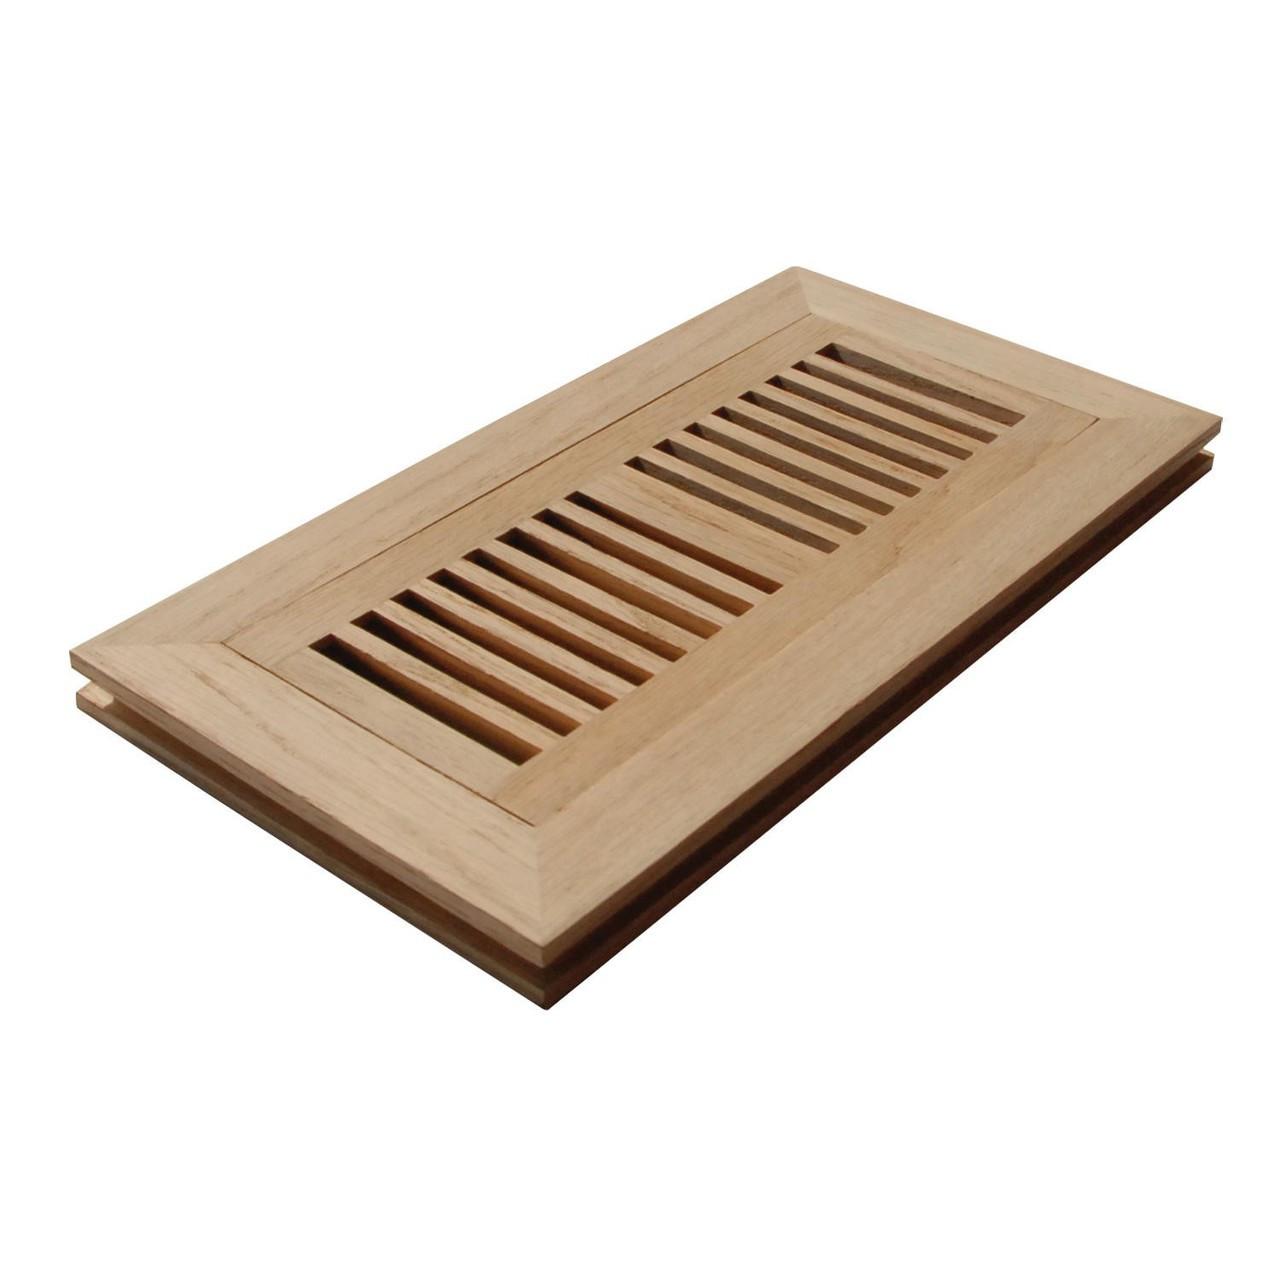 Naiture flush mount wood floor grille for Wood floor registers 6 x 14